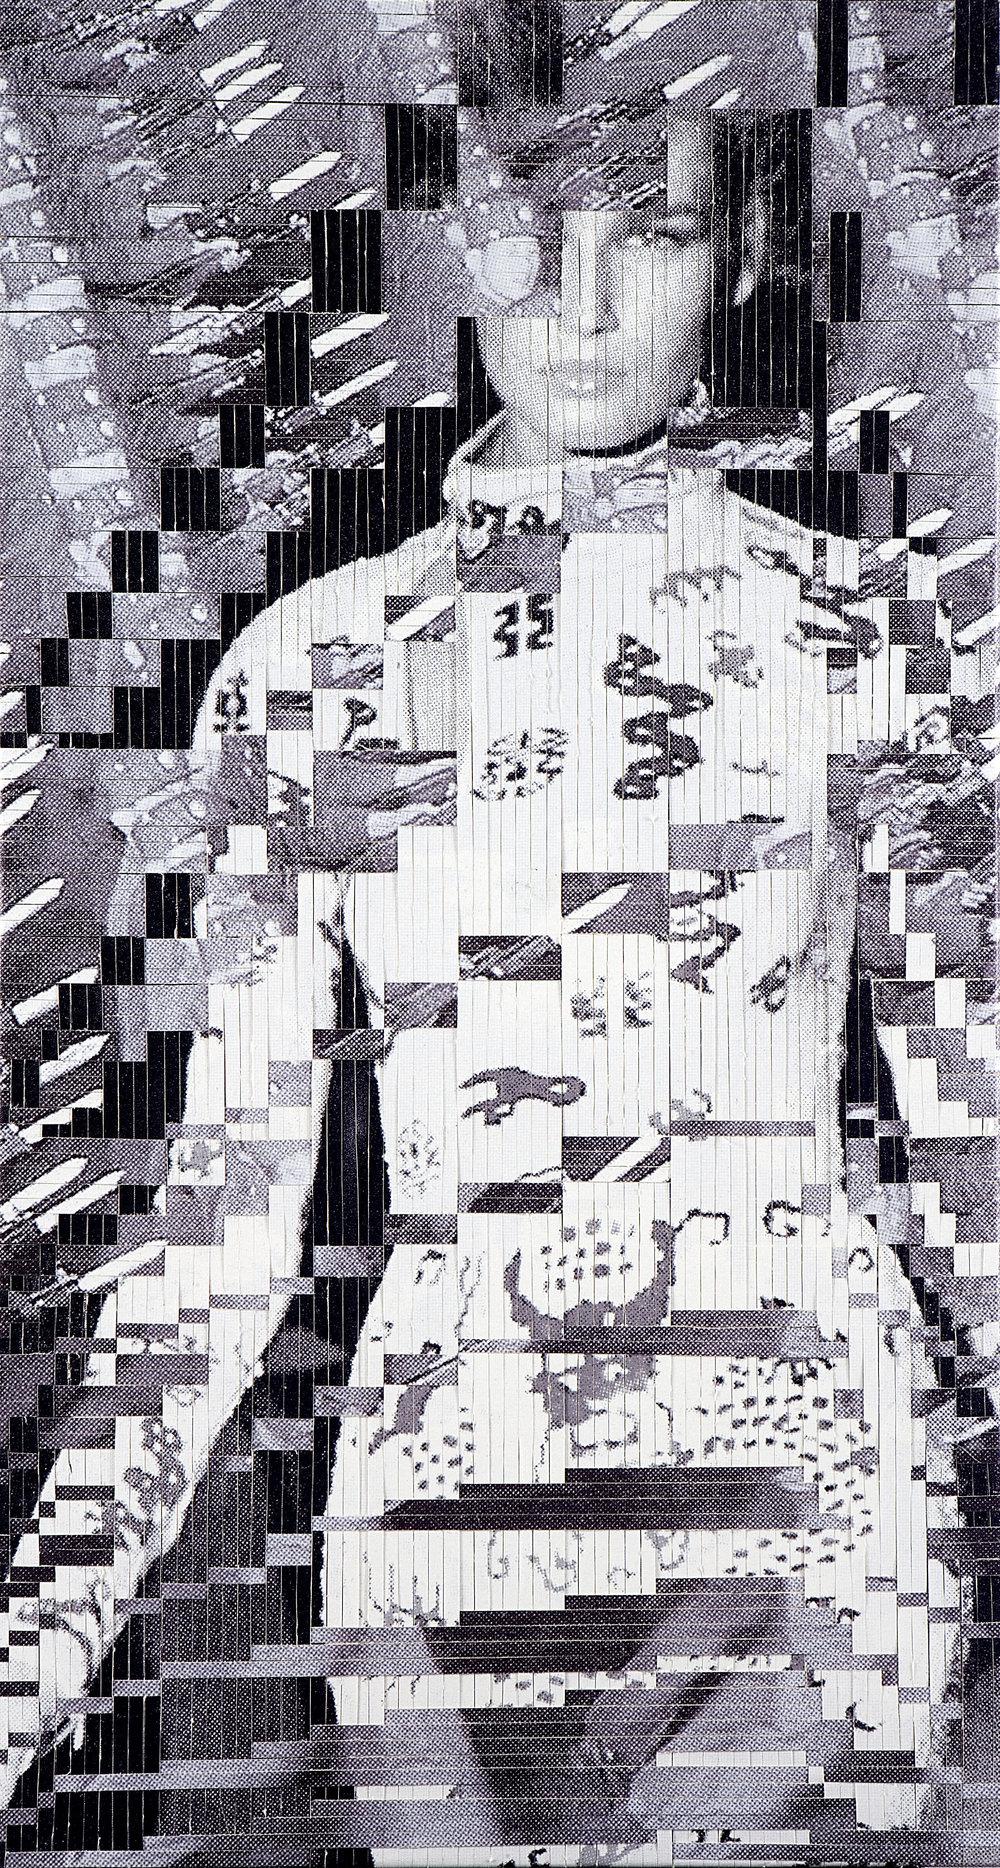 No.4, printed woven canvas, 225 x 118 cm